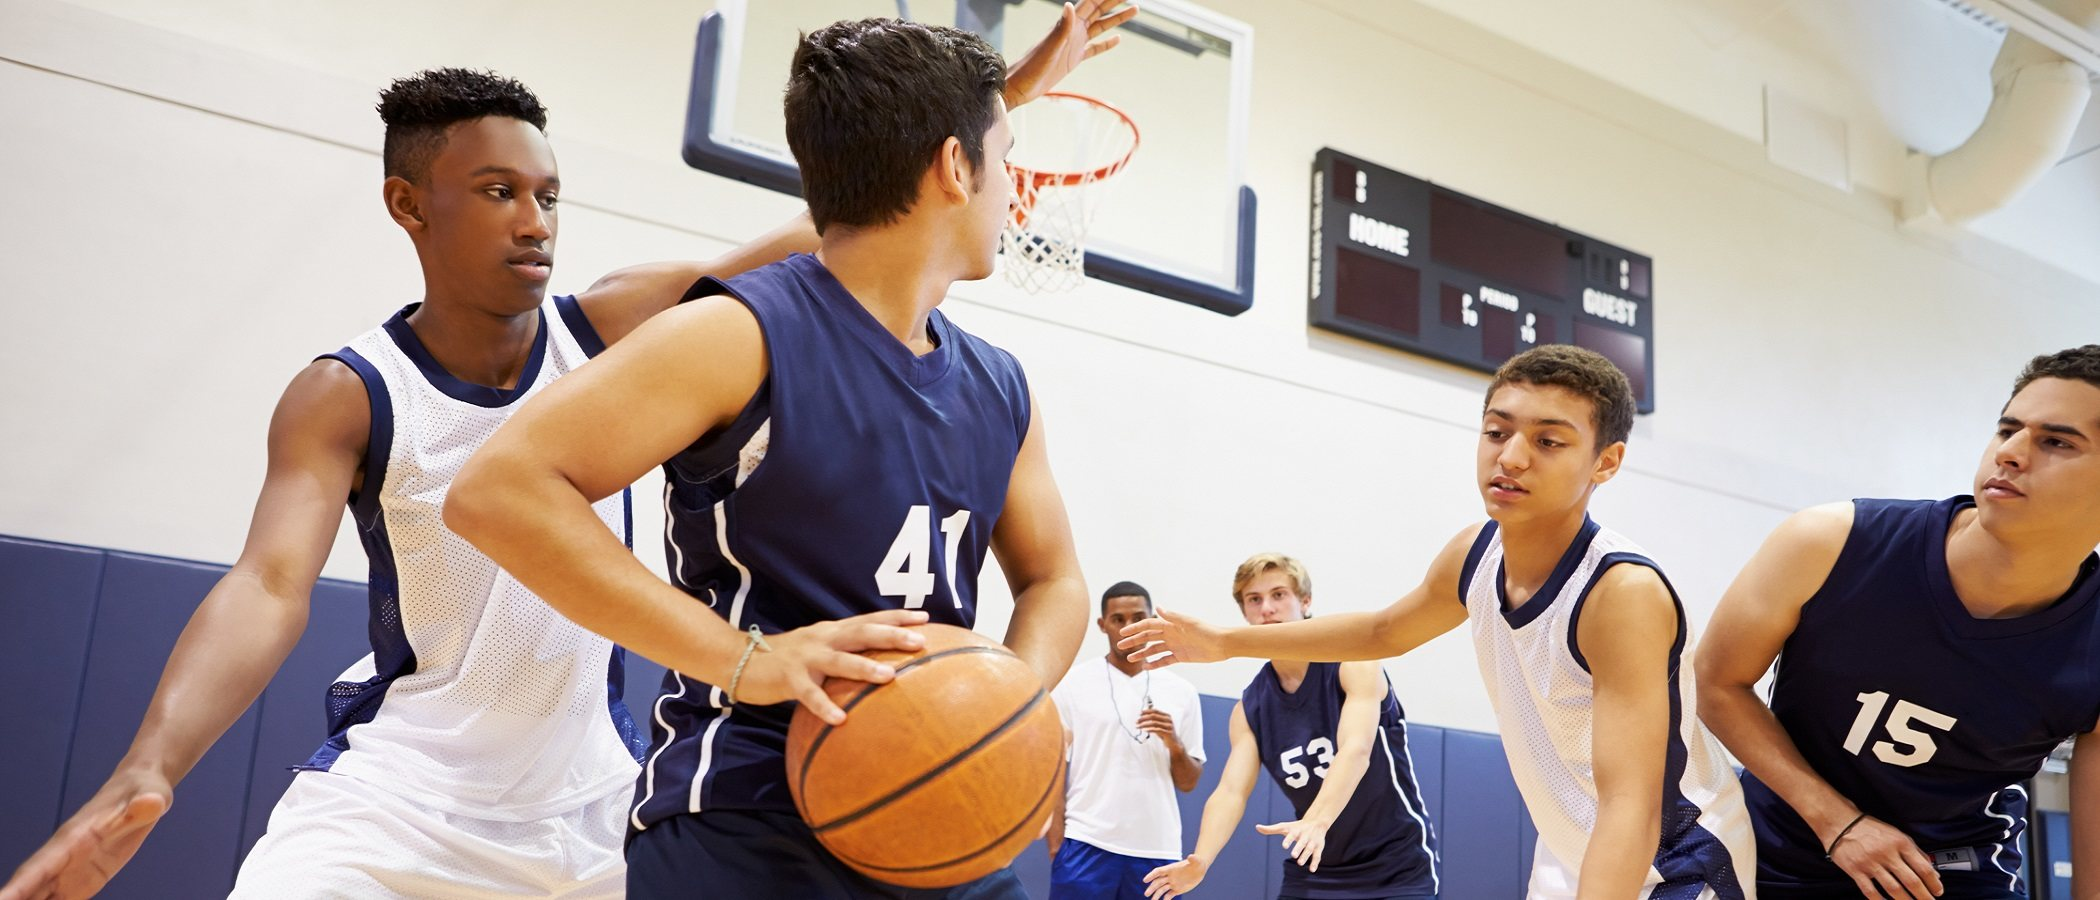 Contras de no participar en actividades extraescolares en secundaria